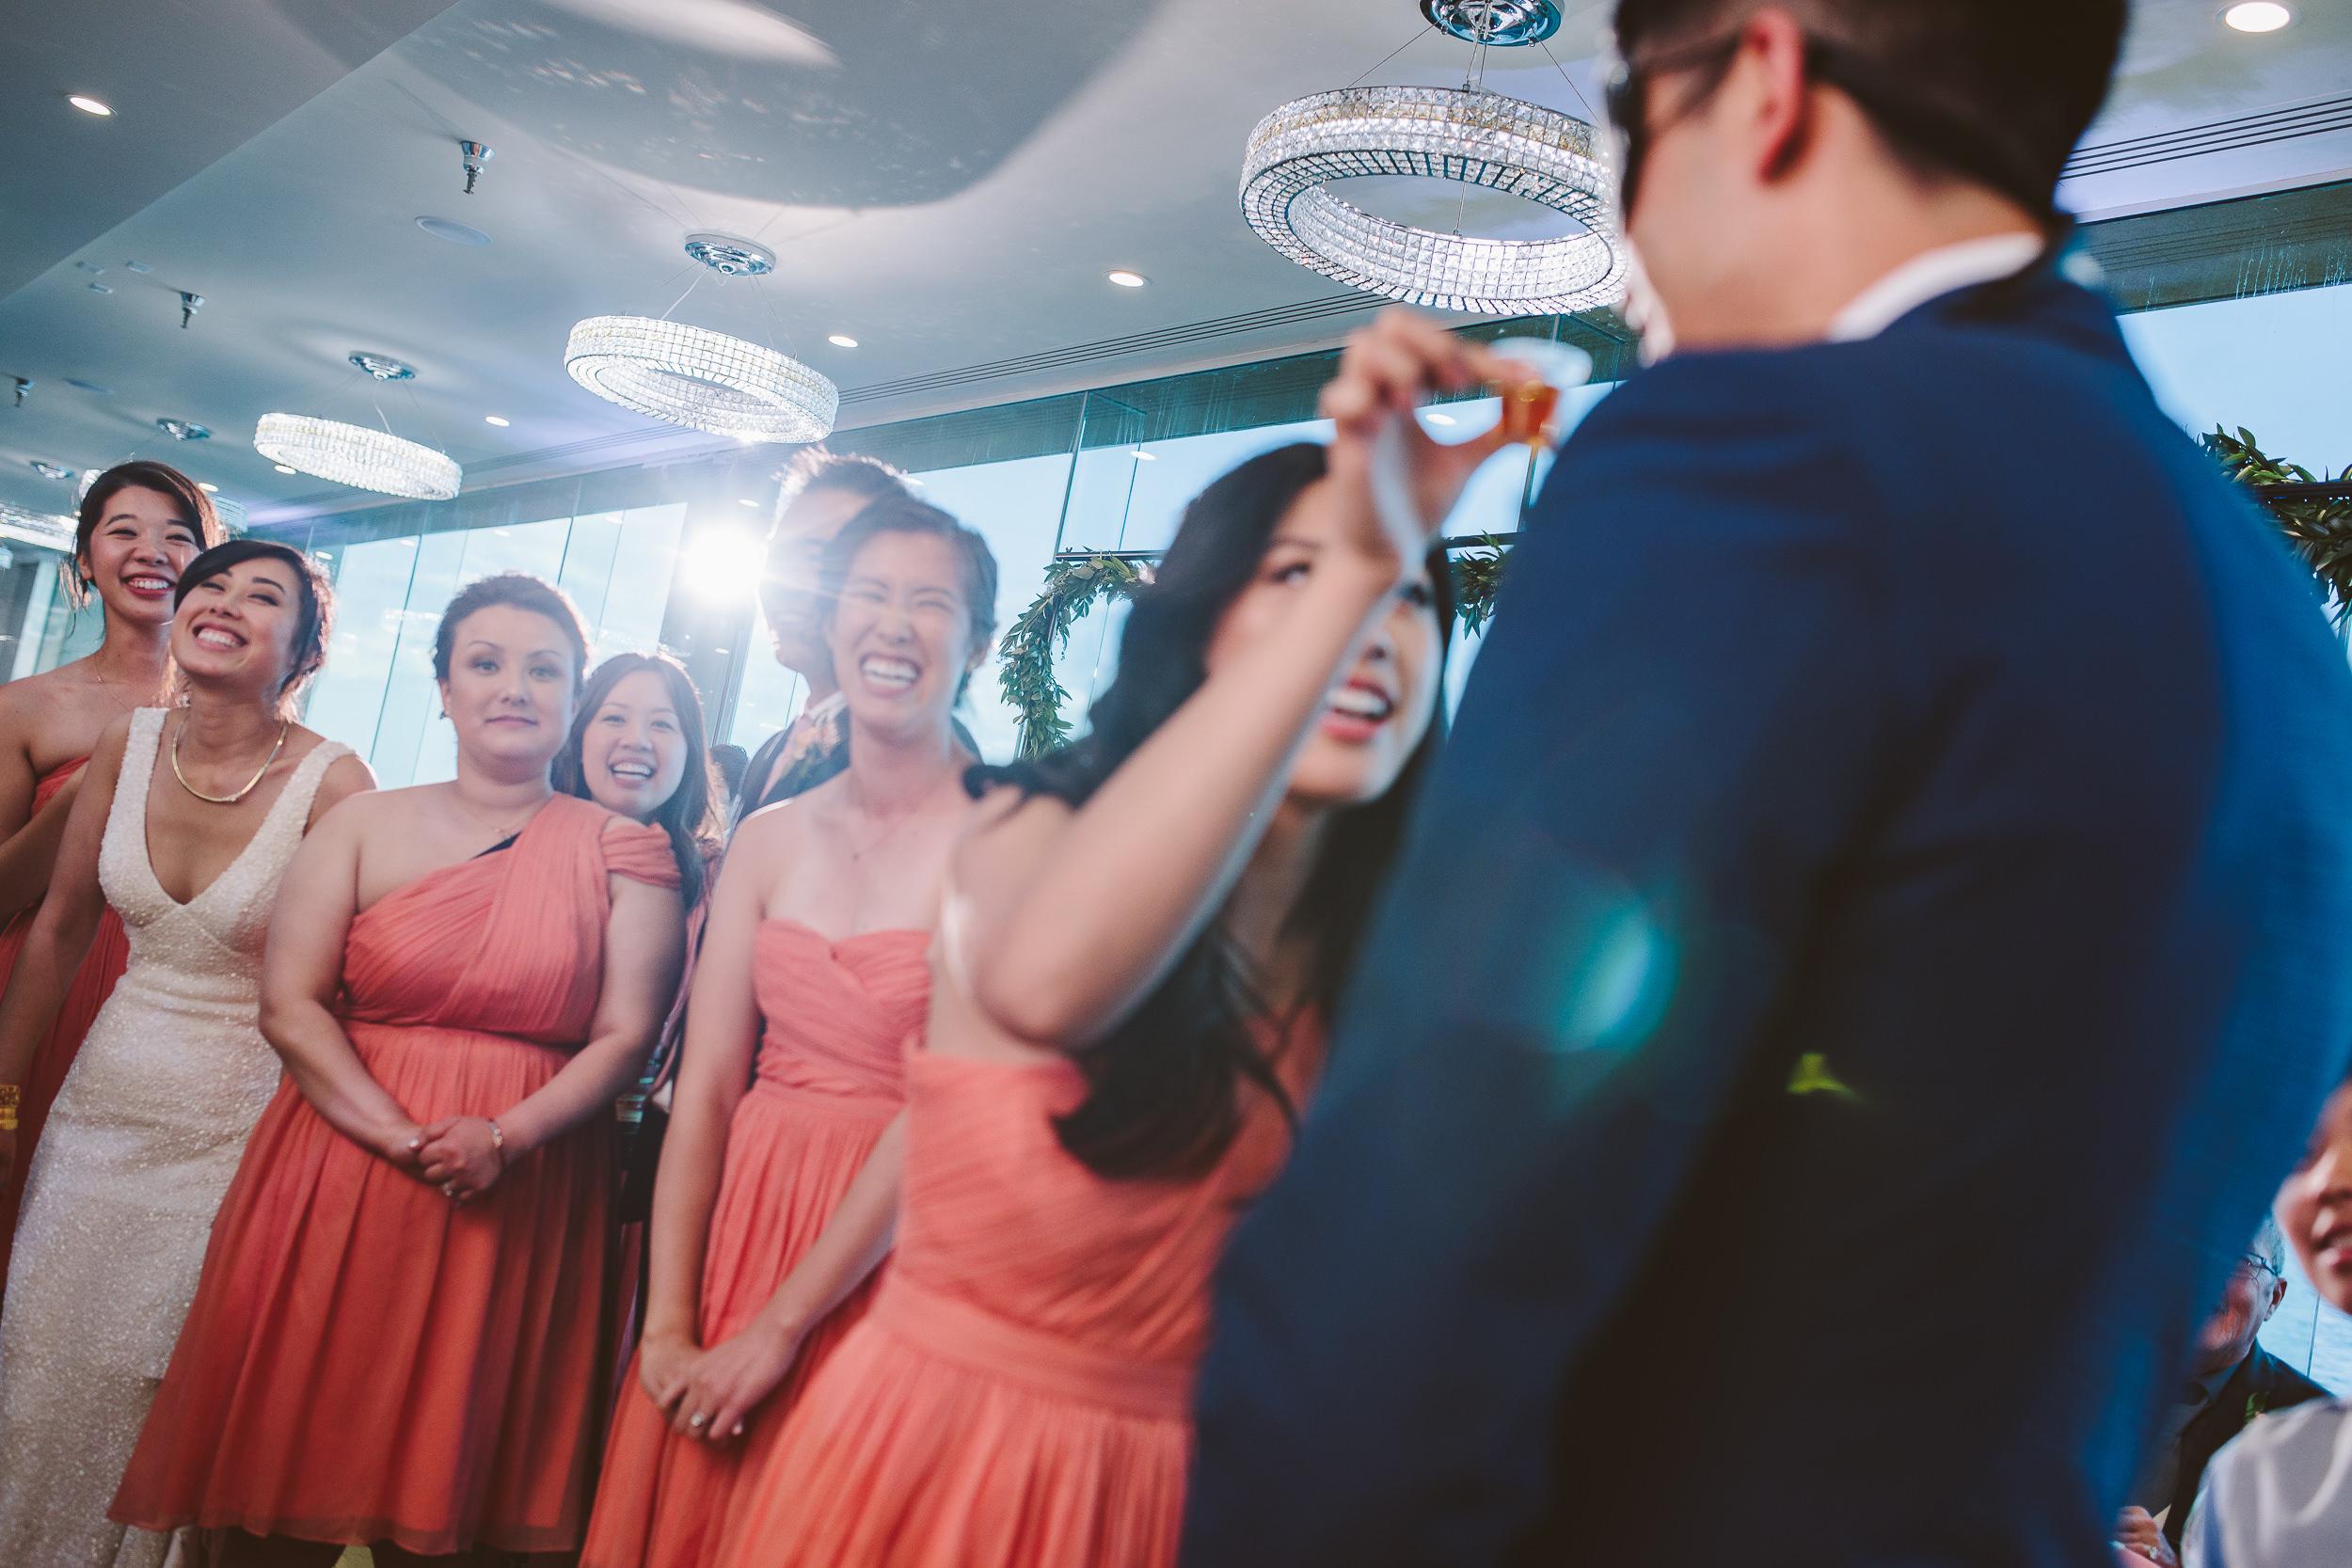 Loews-Regency-San-Francisco-Wedding-Photography-060.jpg